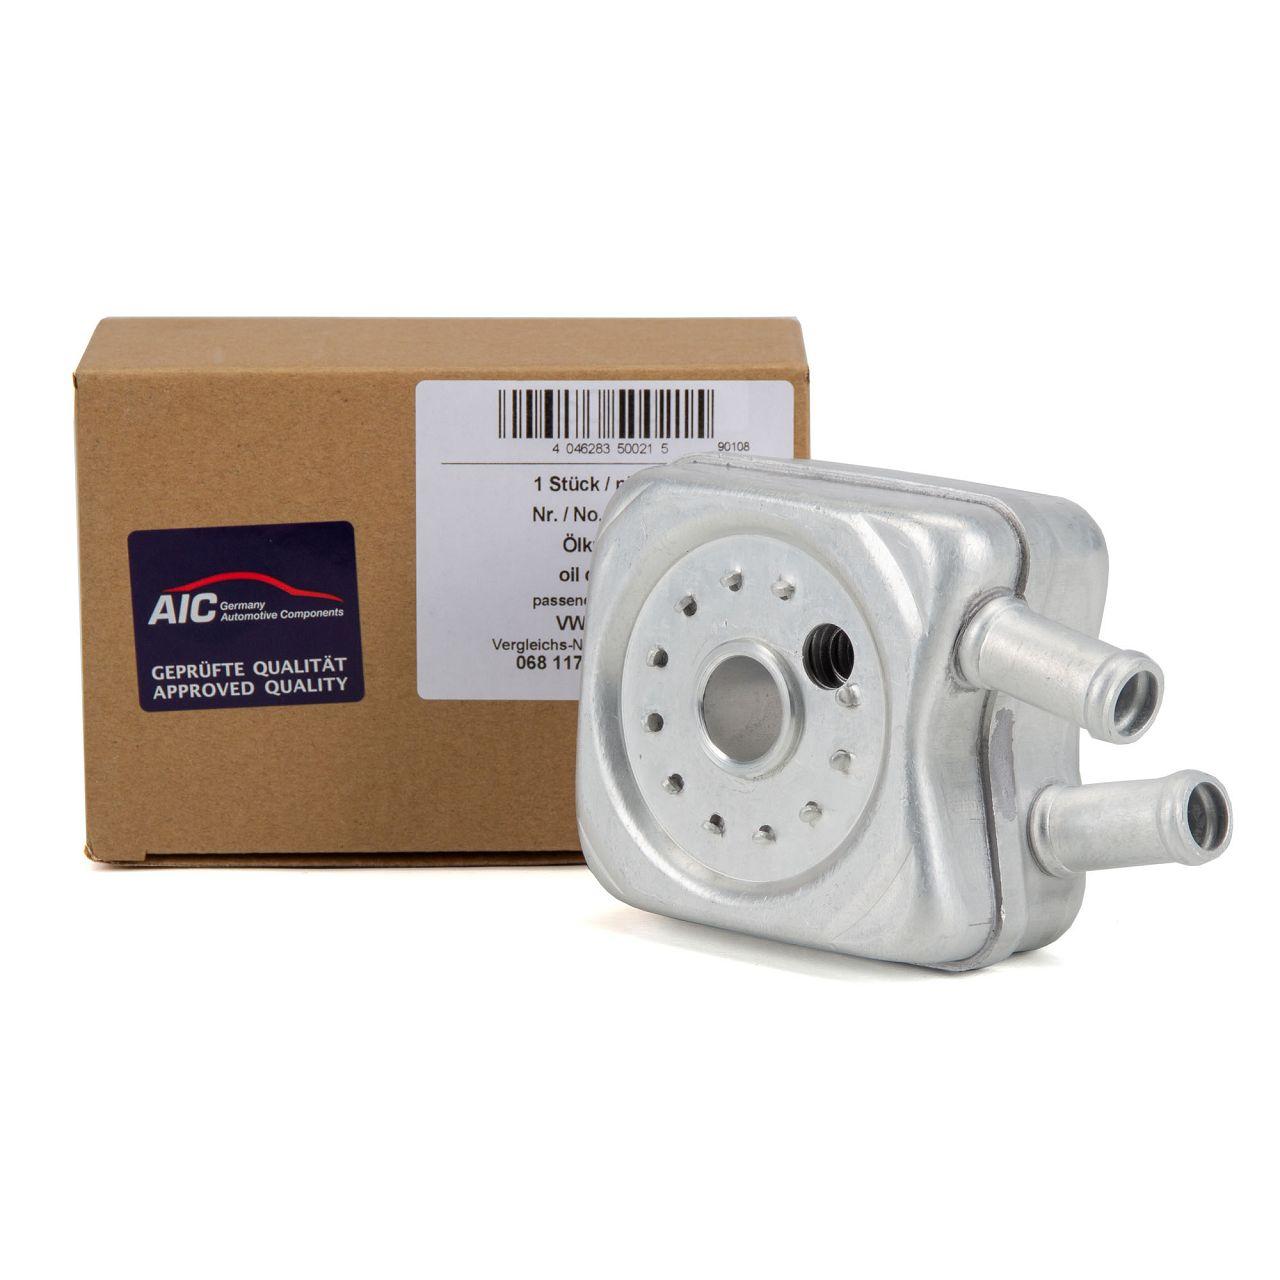 AIC Ölkühler für AUDI 80 100 A4 B5 A6 C4 C5 SEAT ALHAMBRA 7V SKODA VW POLO 6N